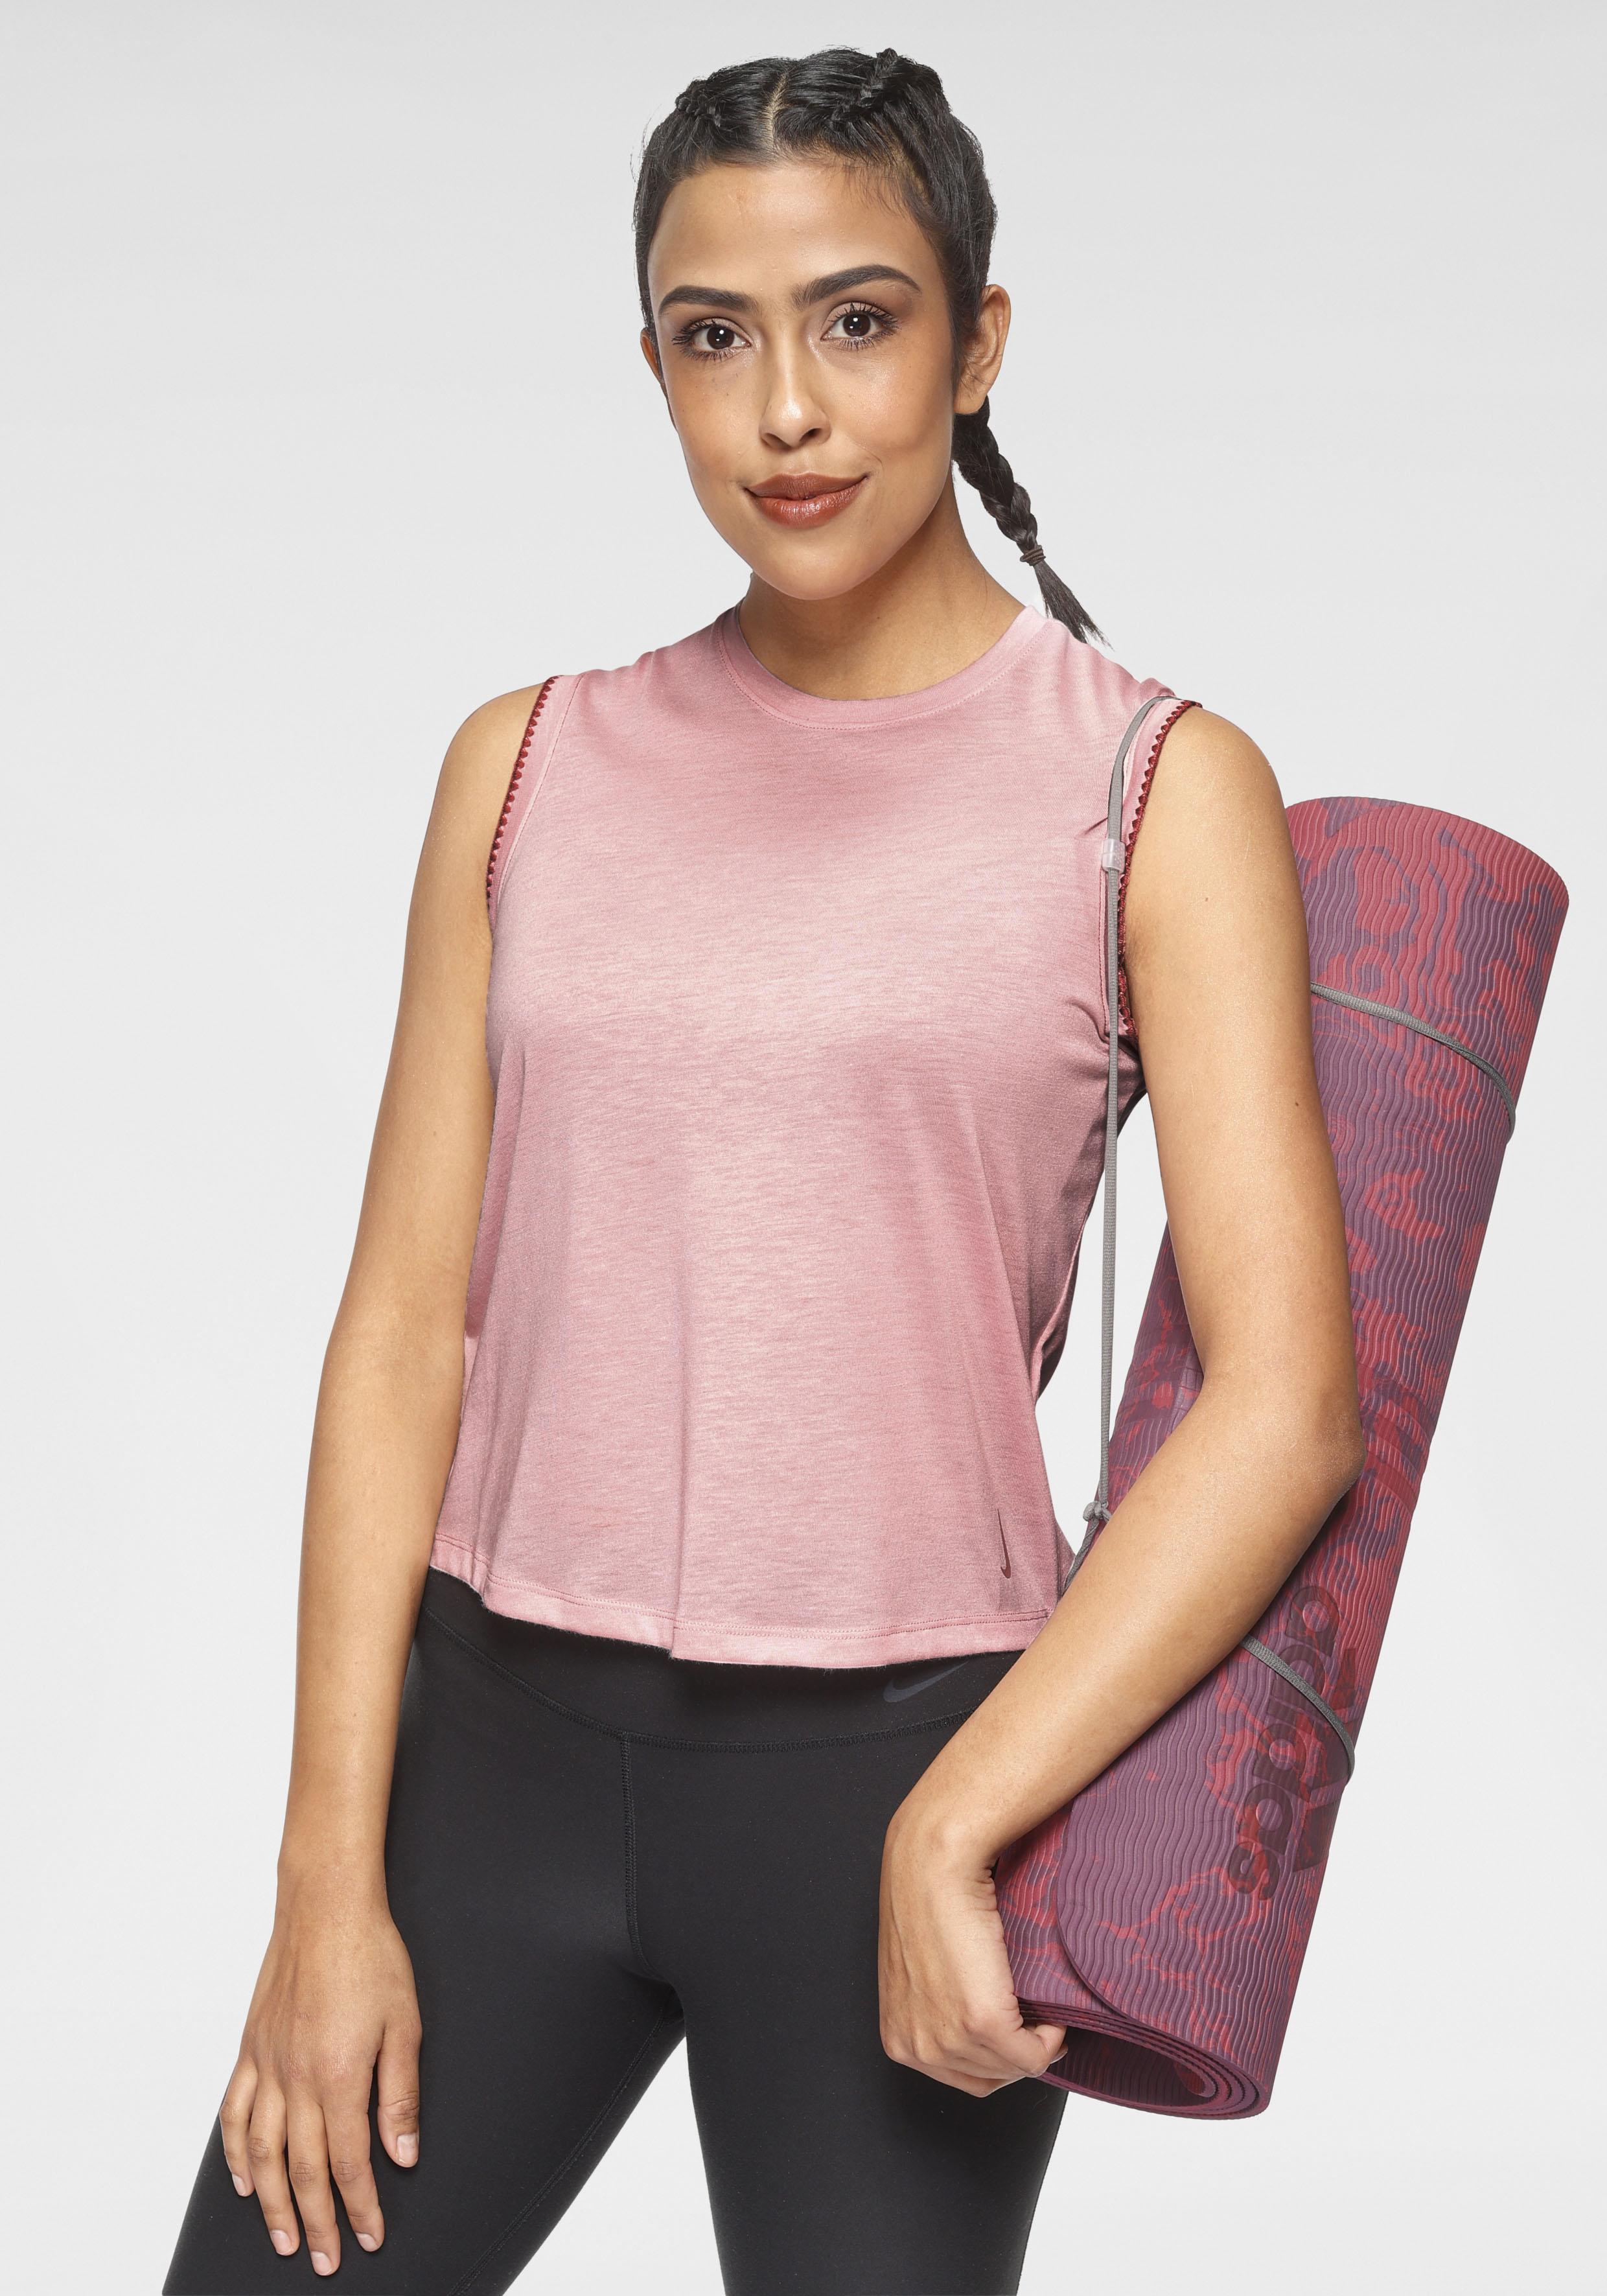 Nike Yogatop Yoga Women's Crochet Tank rosa Damen Bekleidung